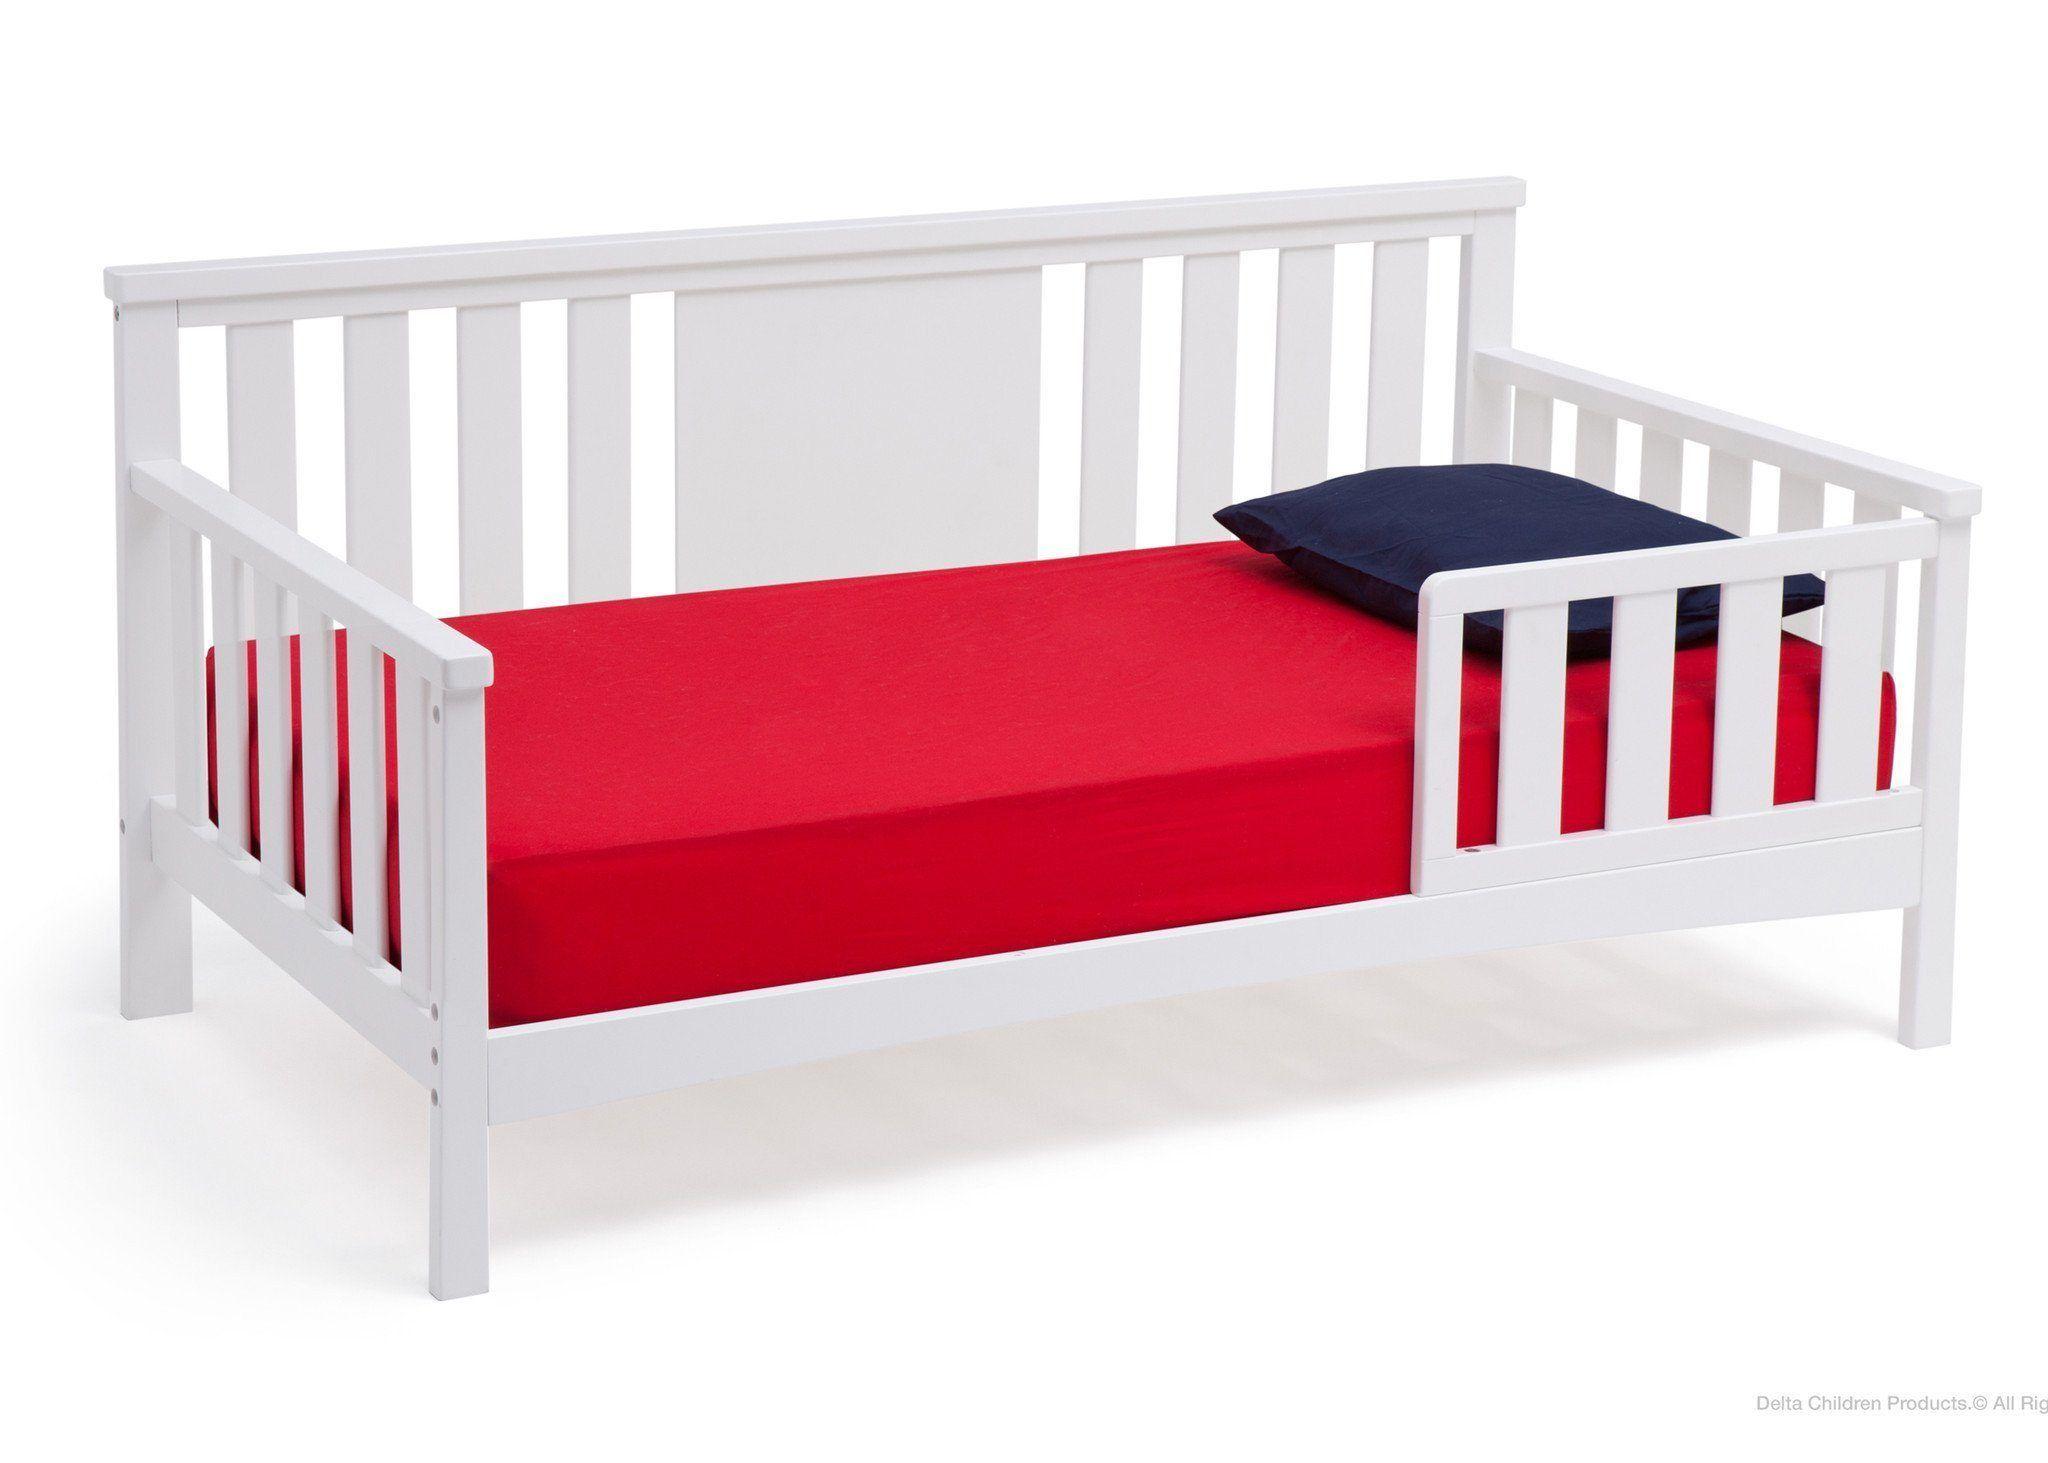 Solutions Toddler Daybed Toddler bed, Kid beds, Toddler